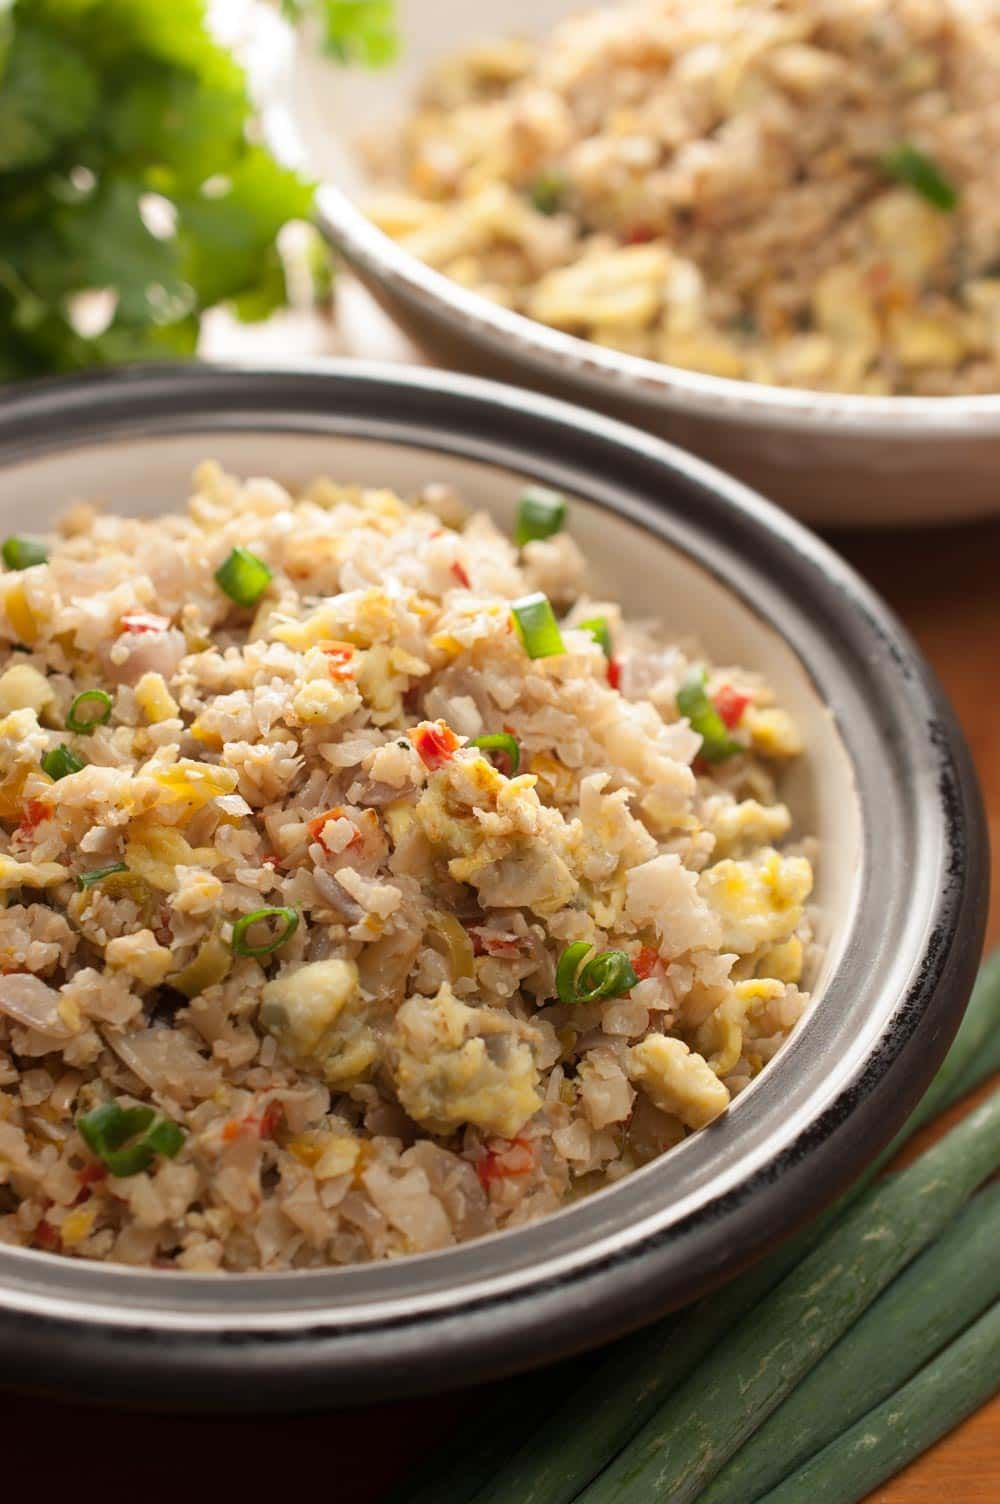 Cauliflower rice stir fry with eggs paleo keto gluten